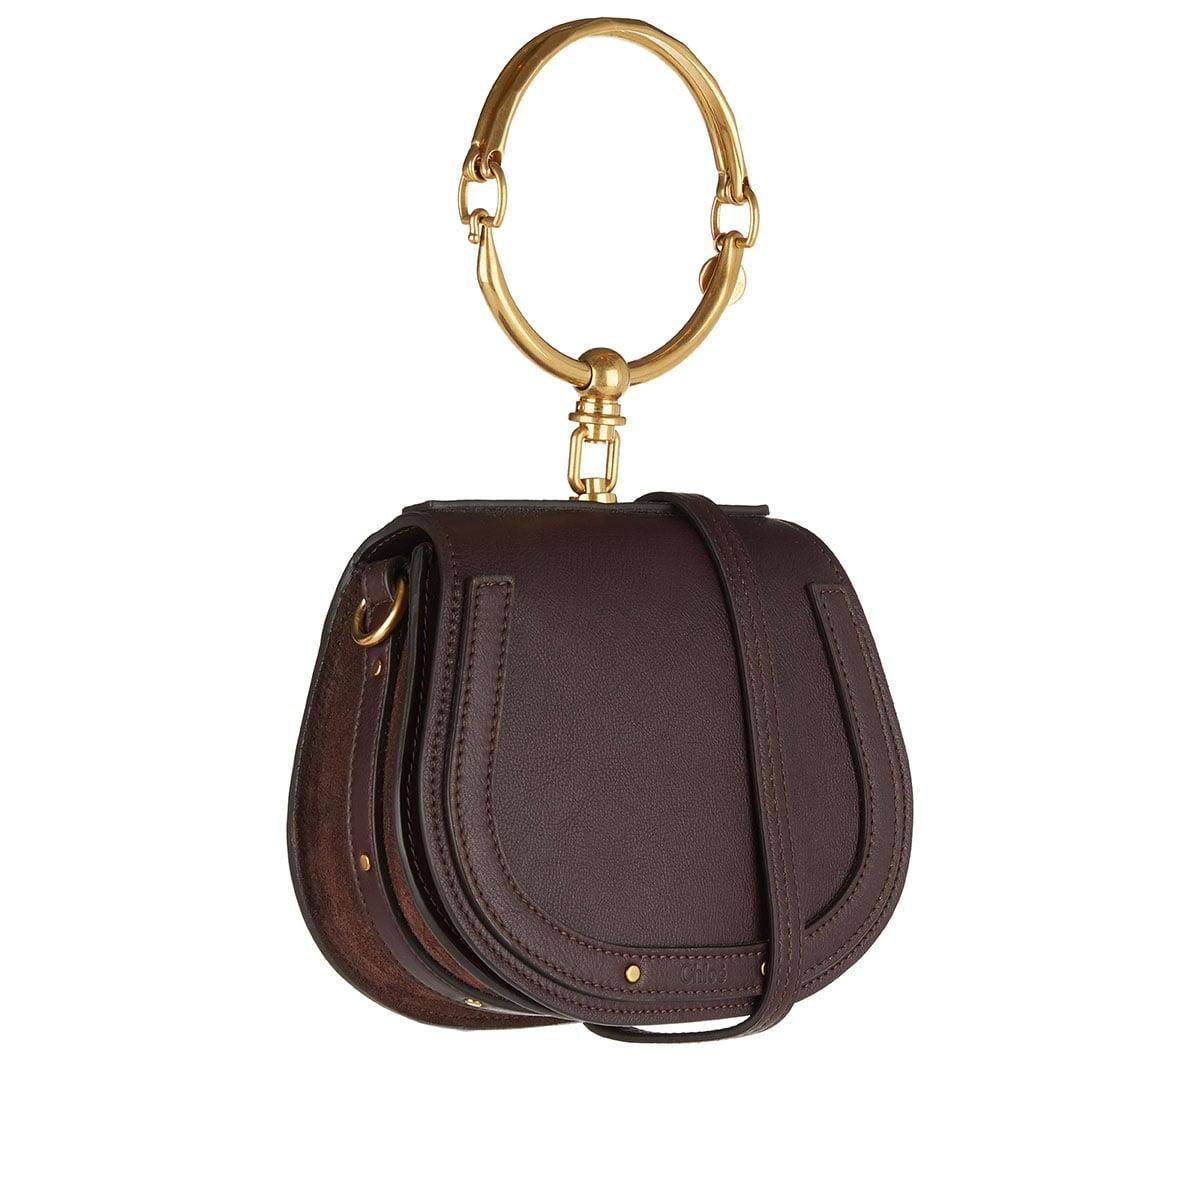 Small Nile leather bracelet bag